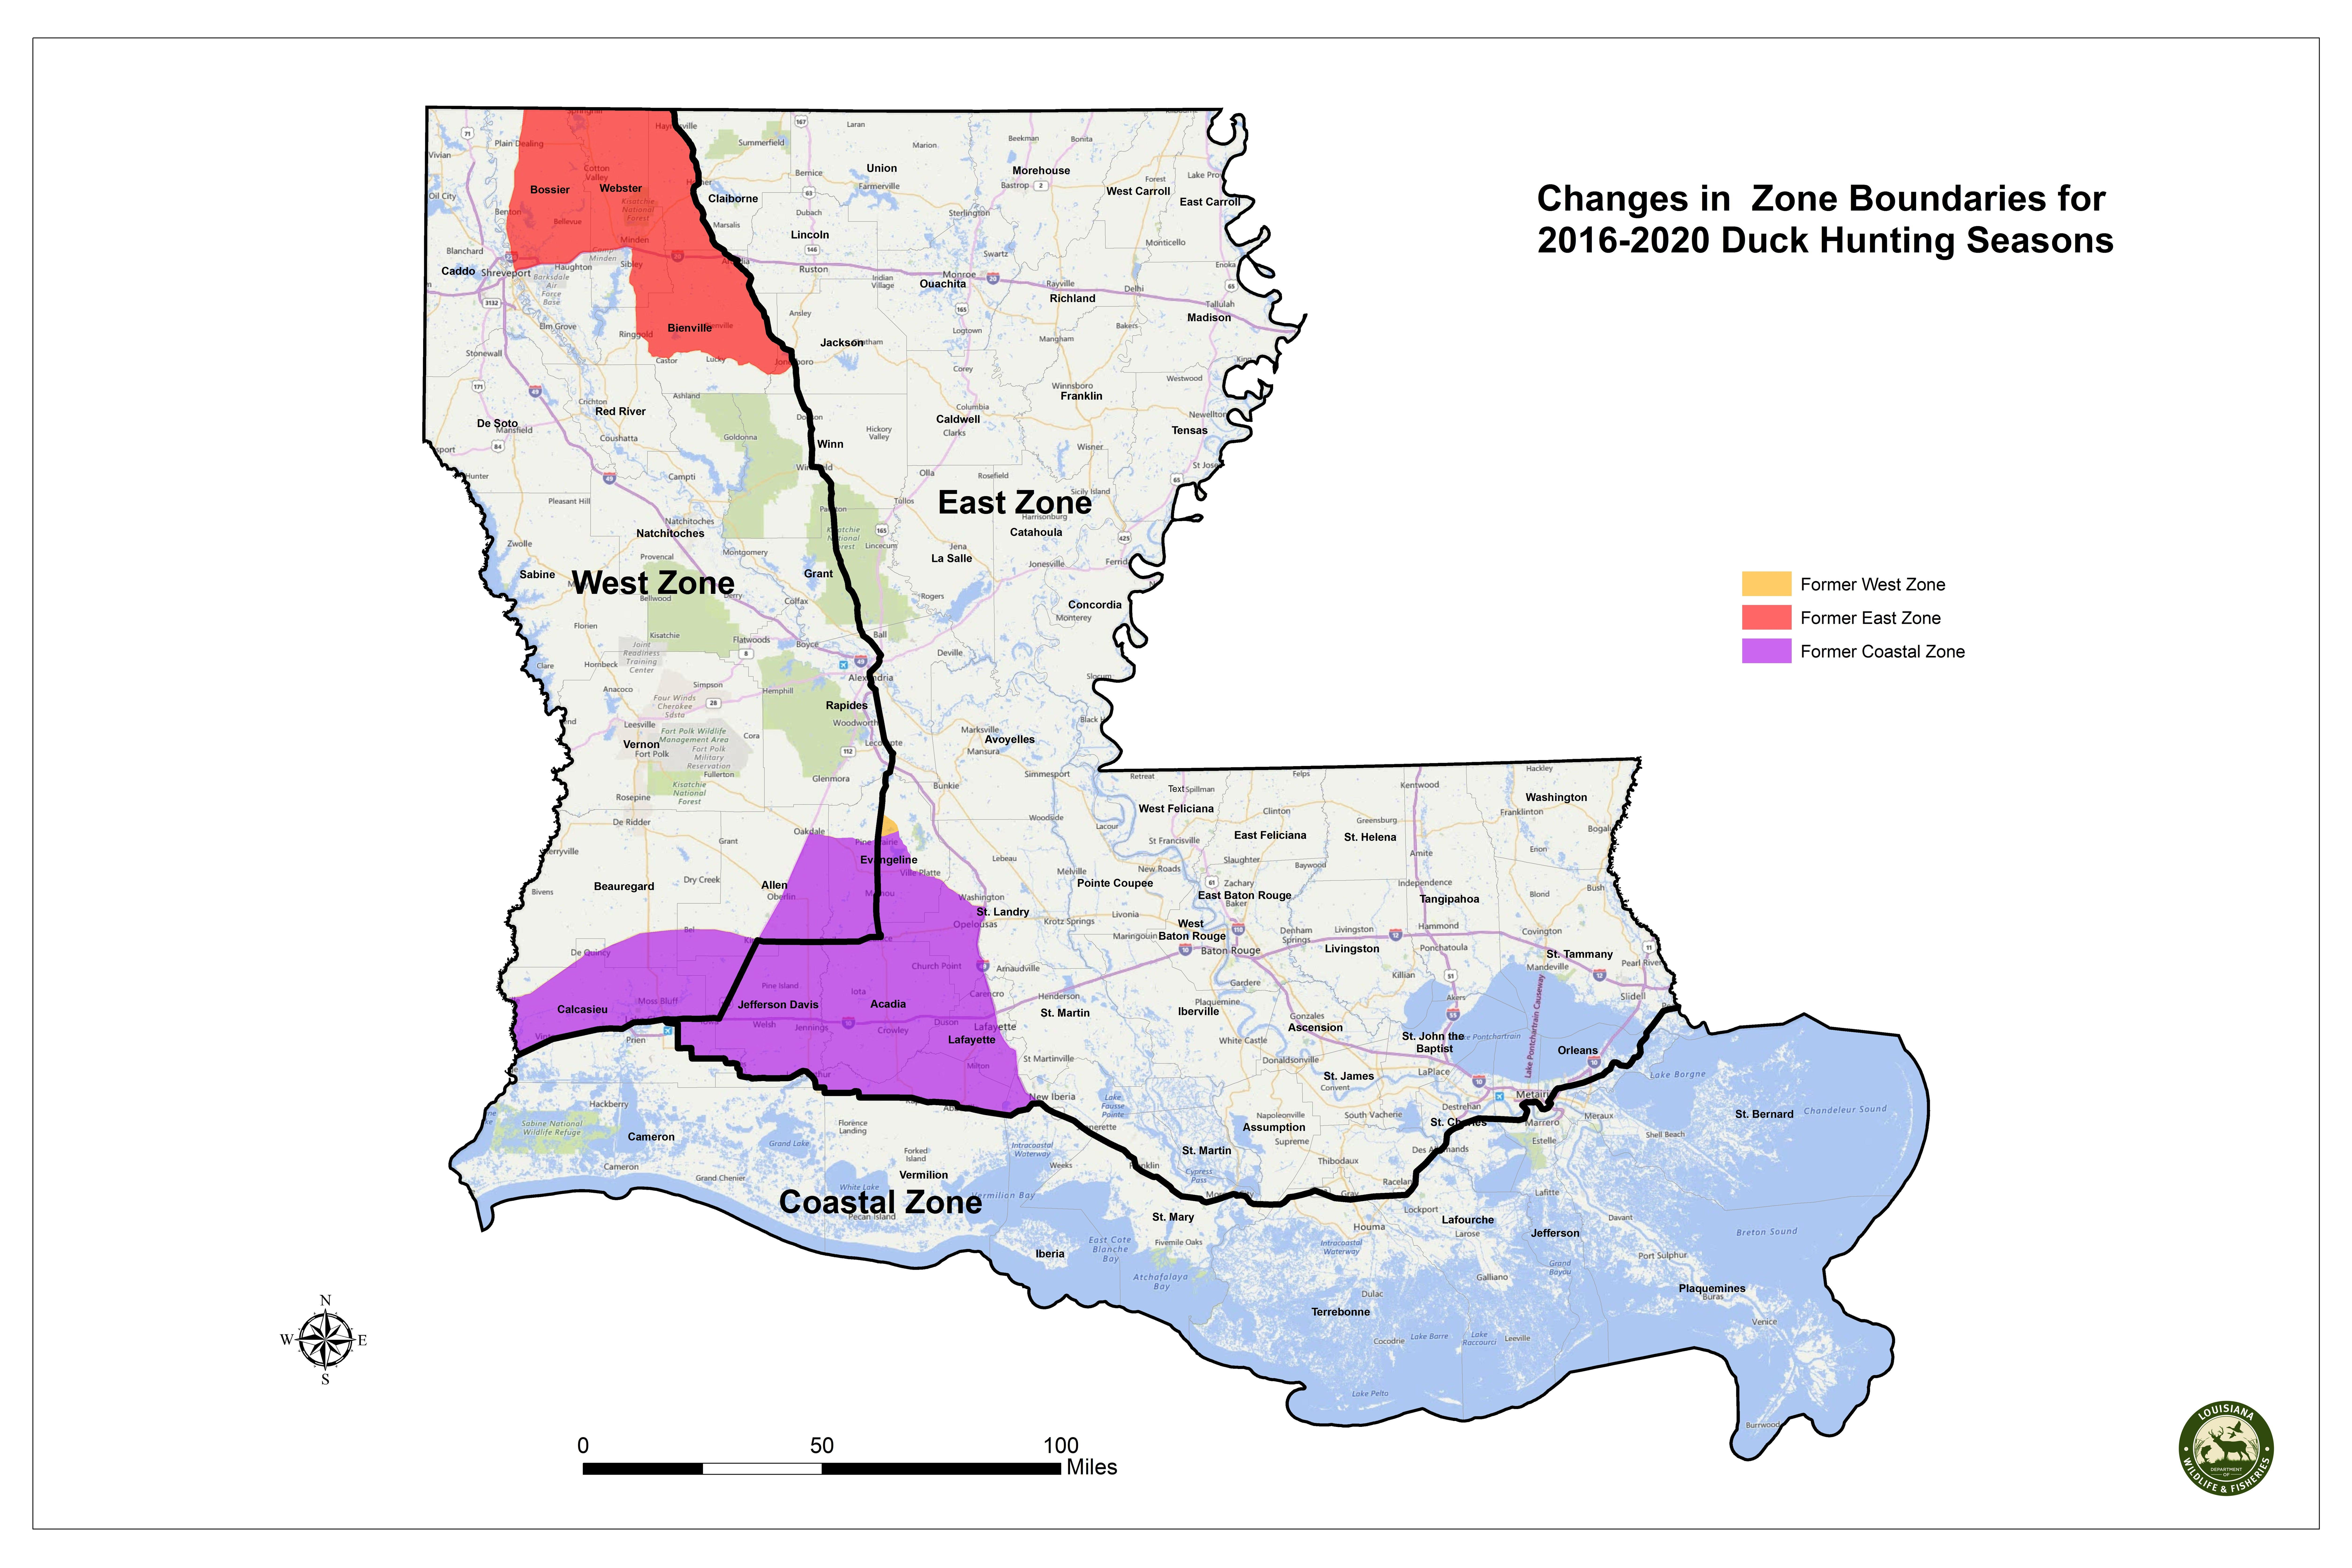 New duck hunting zones take effect Nov 5